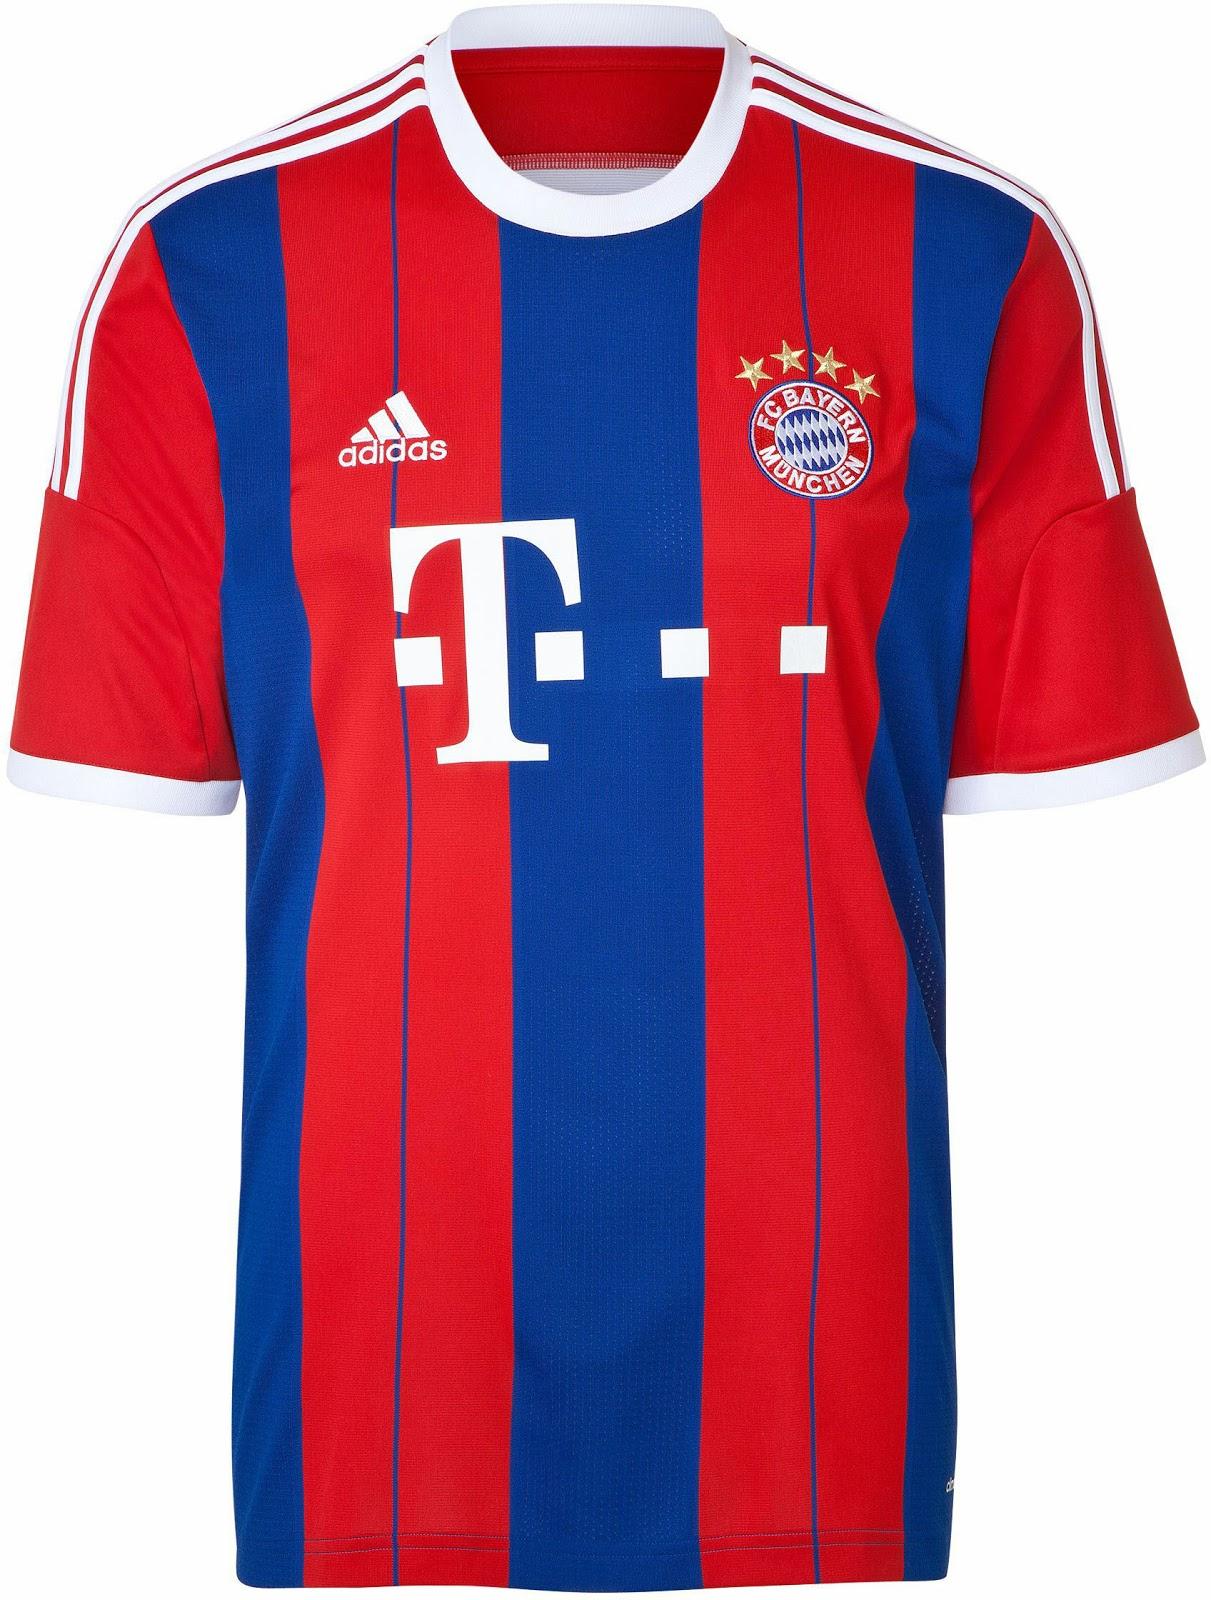 new arrival bb035 b9881 FlagWigs: FC Bayern München Home Jersey Shirt Kit 2014 2015 ...